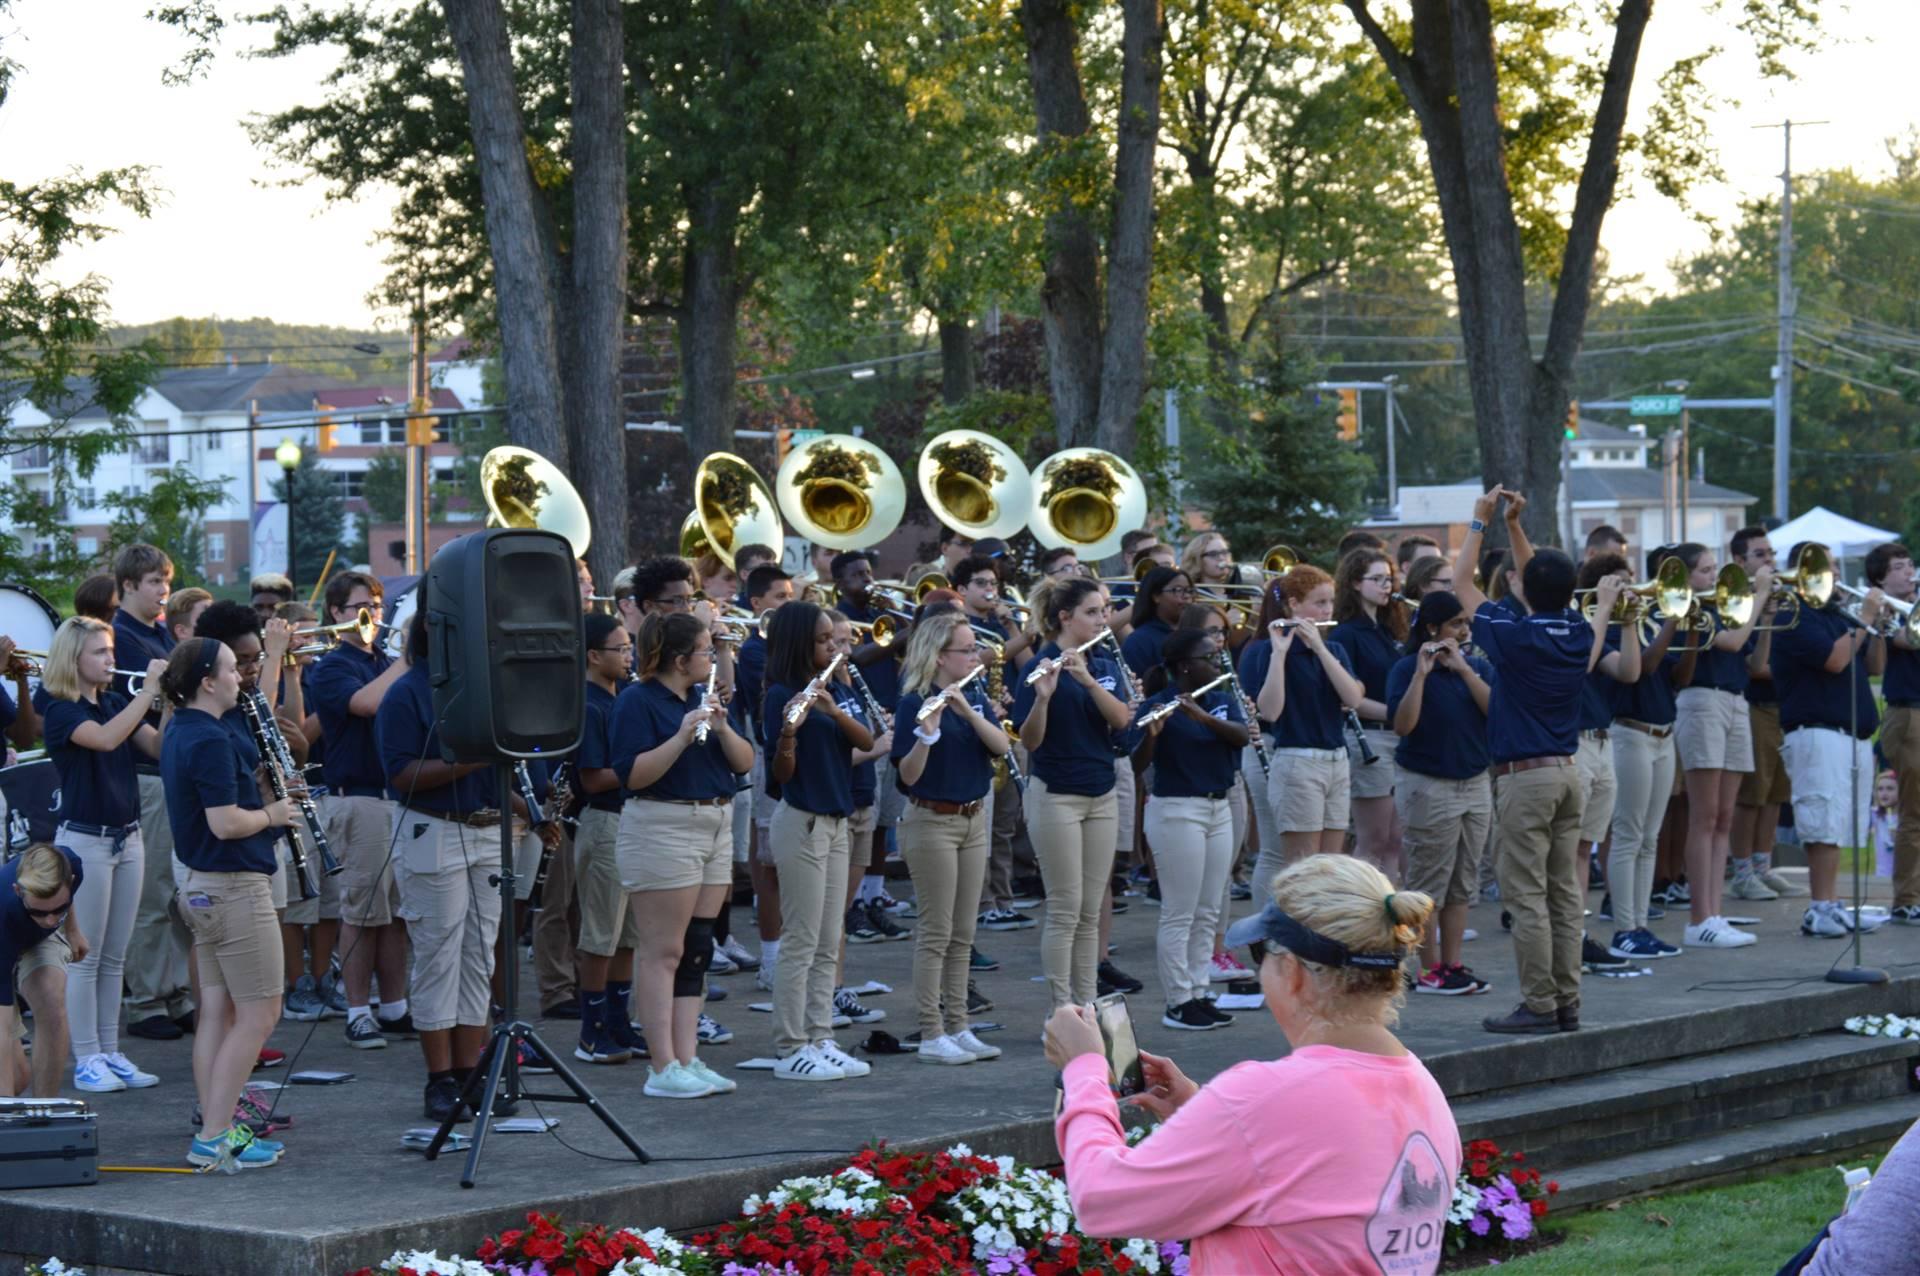 Band Performing at Bicentenial